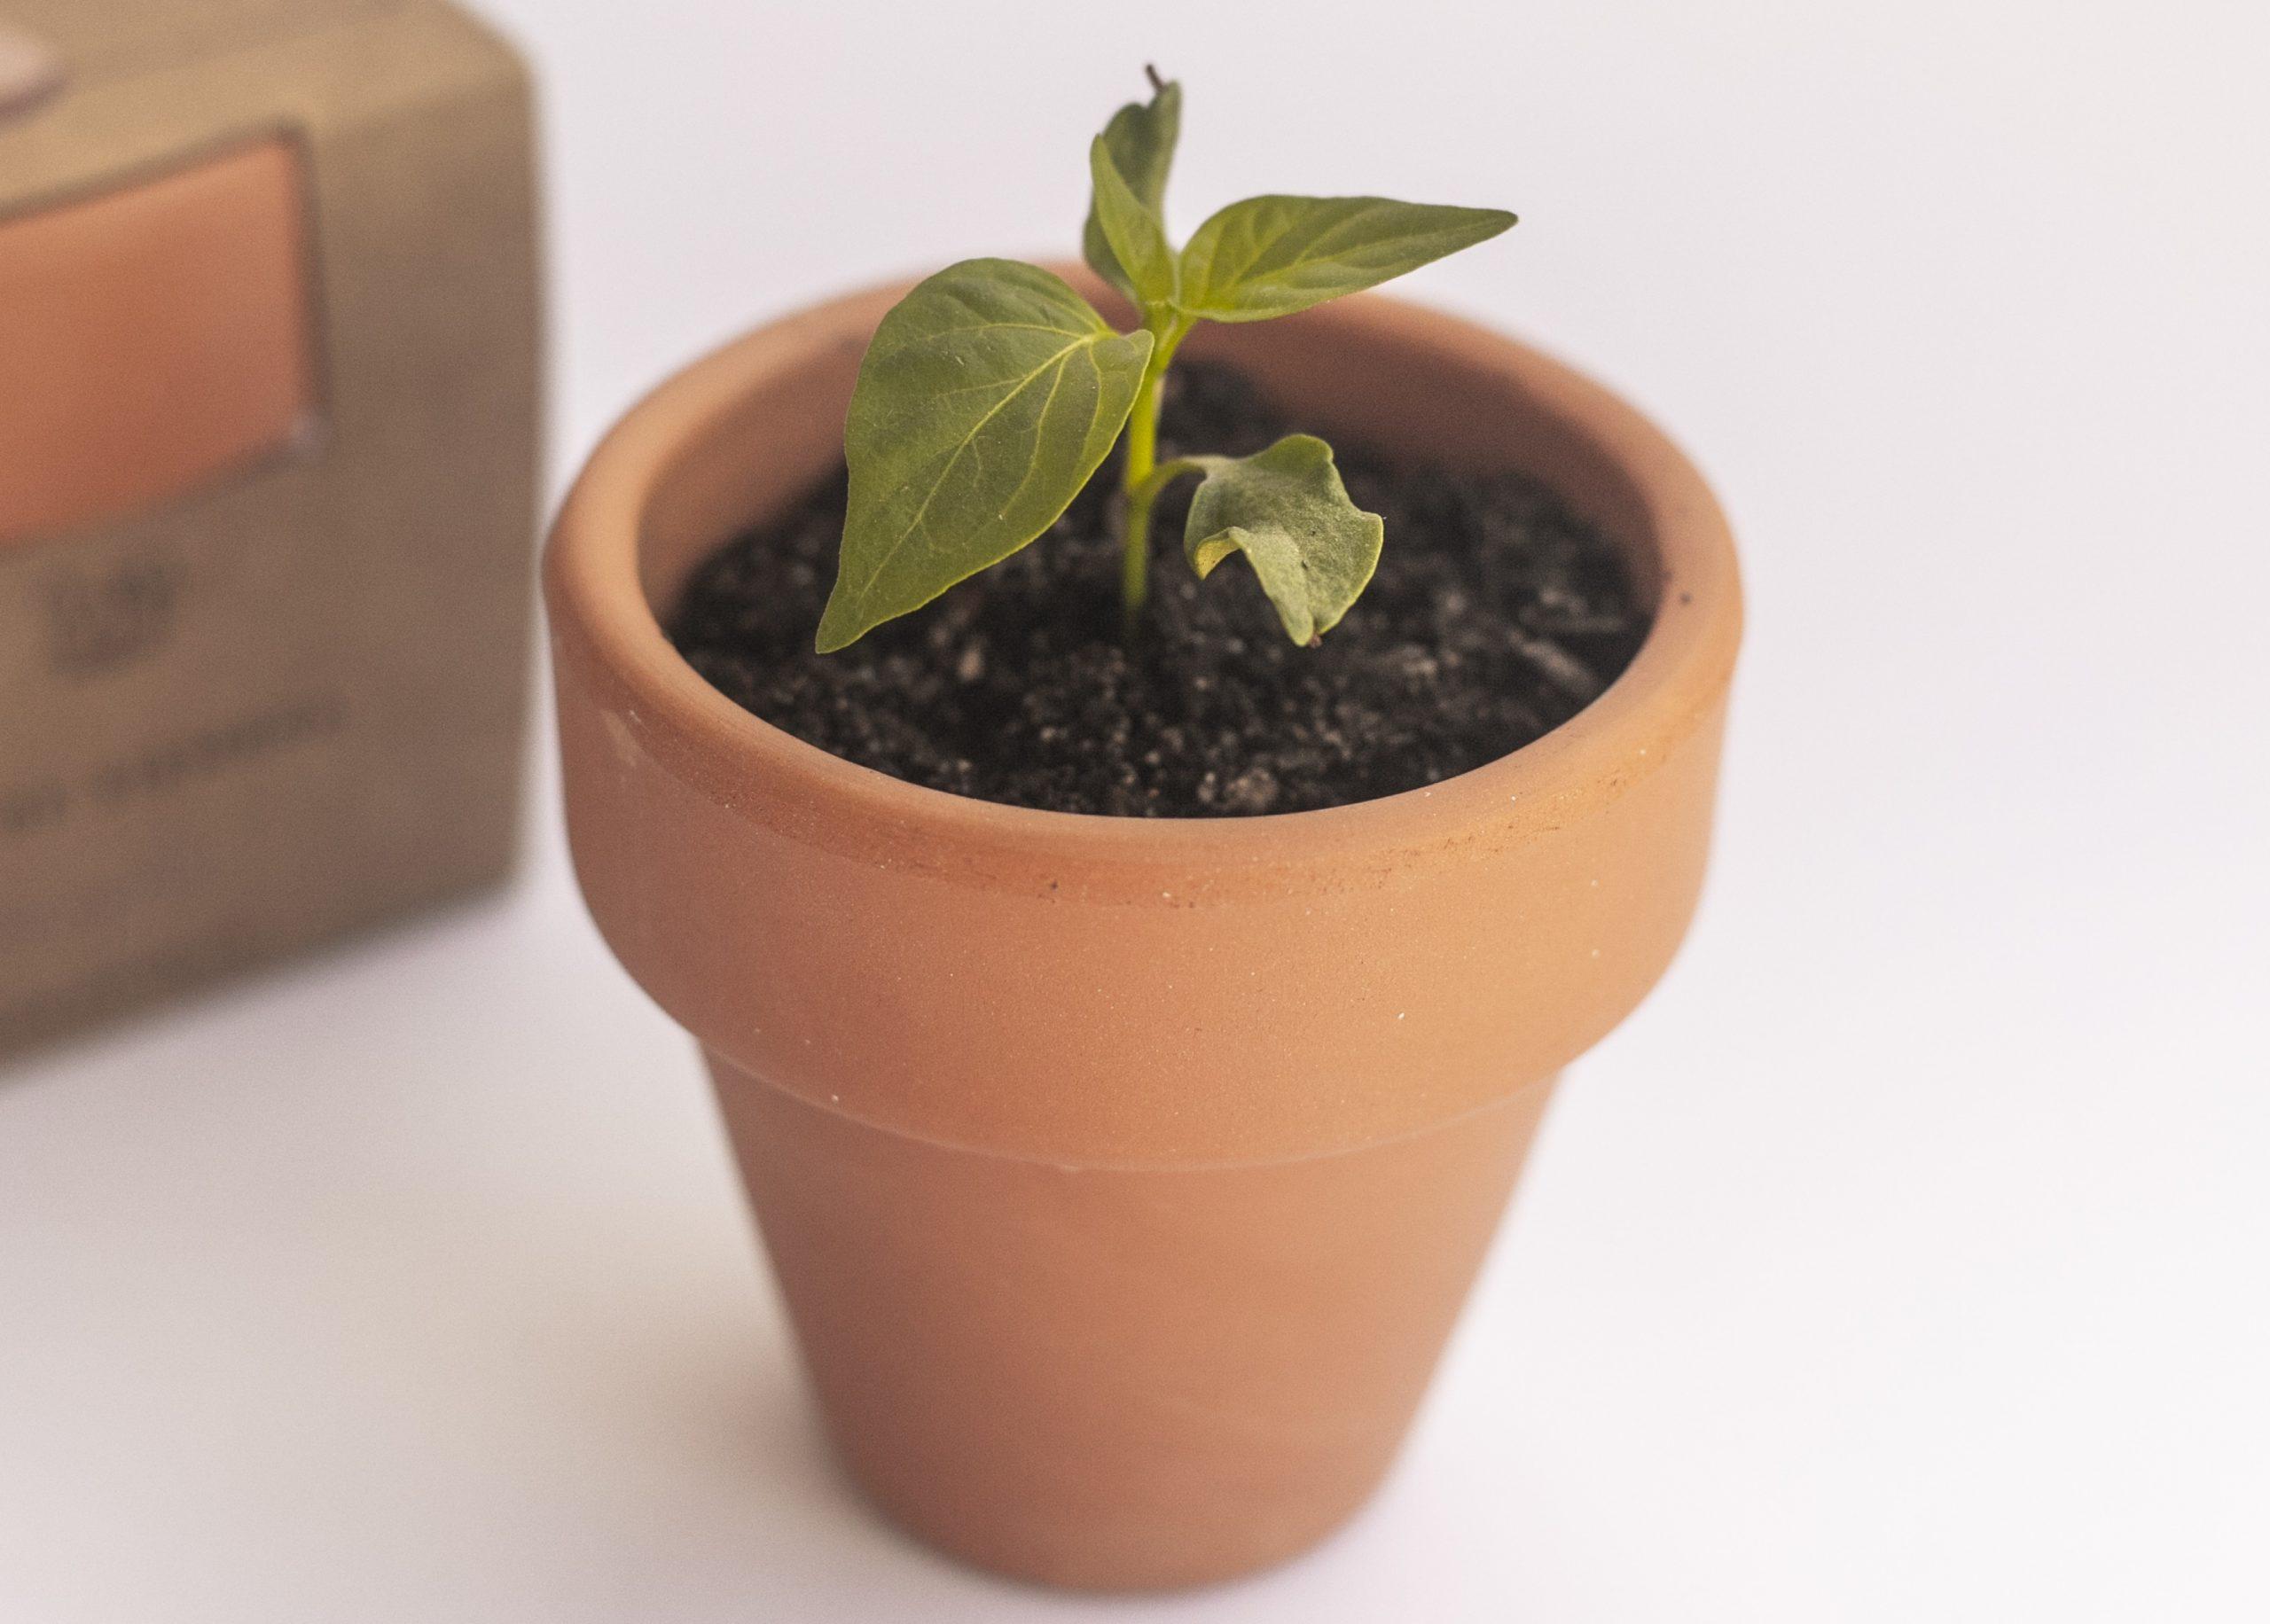 planta papeleria sostenible regalo ecologico